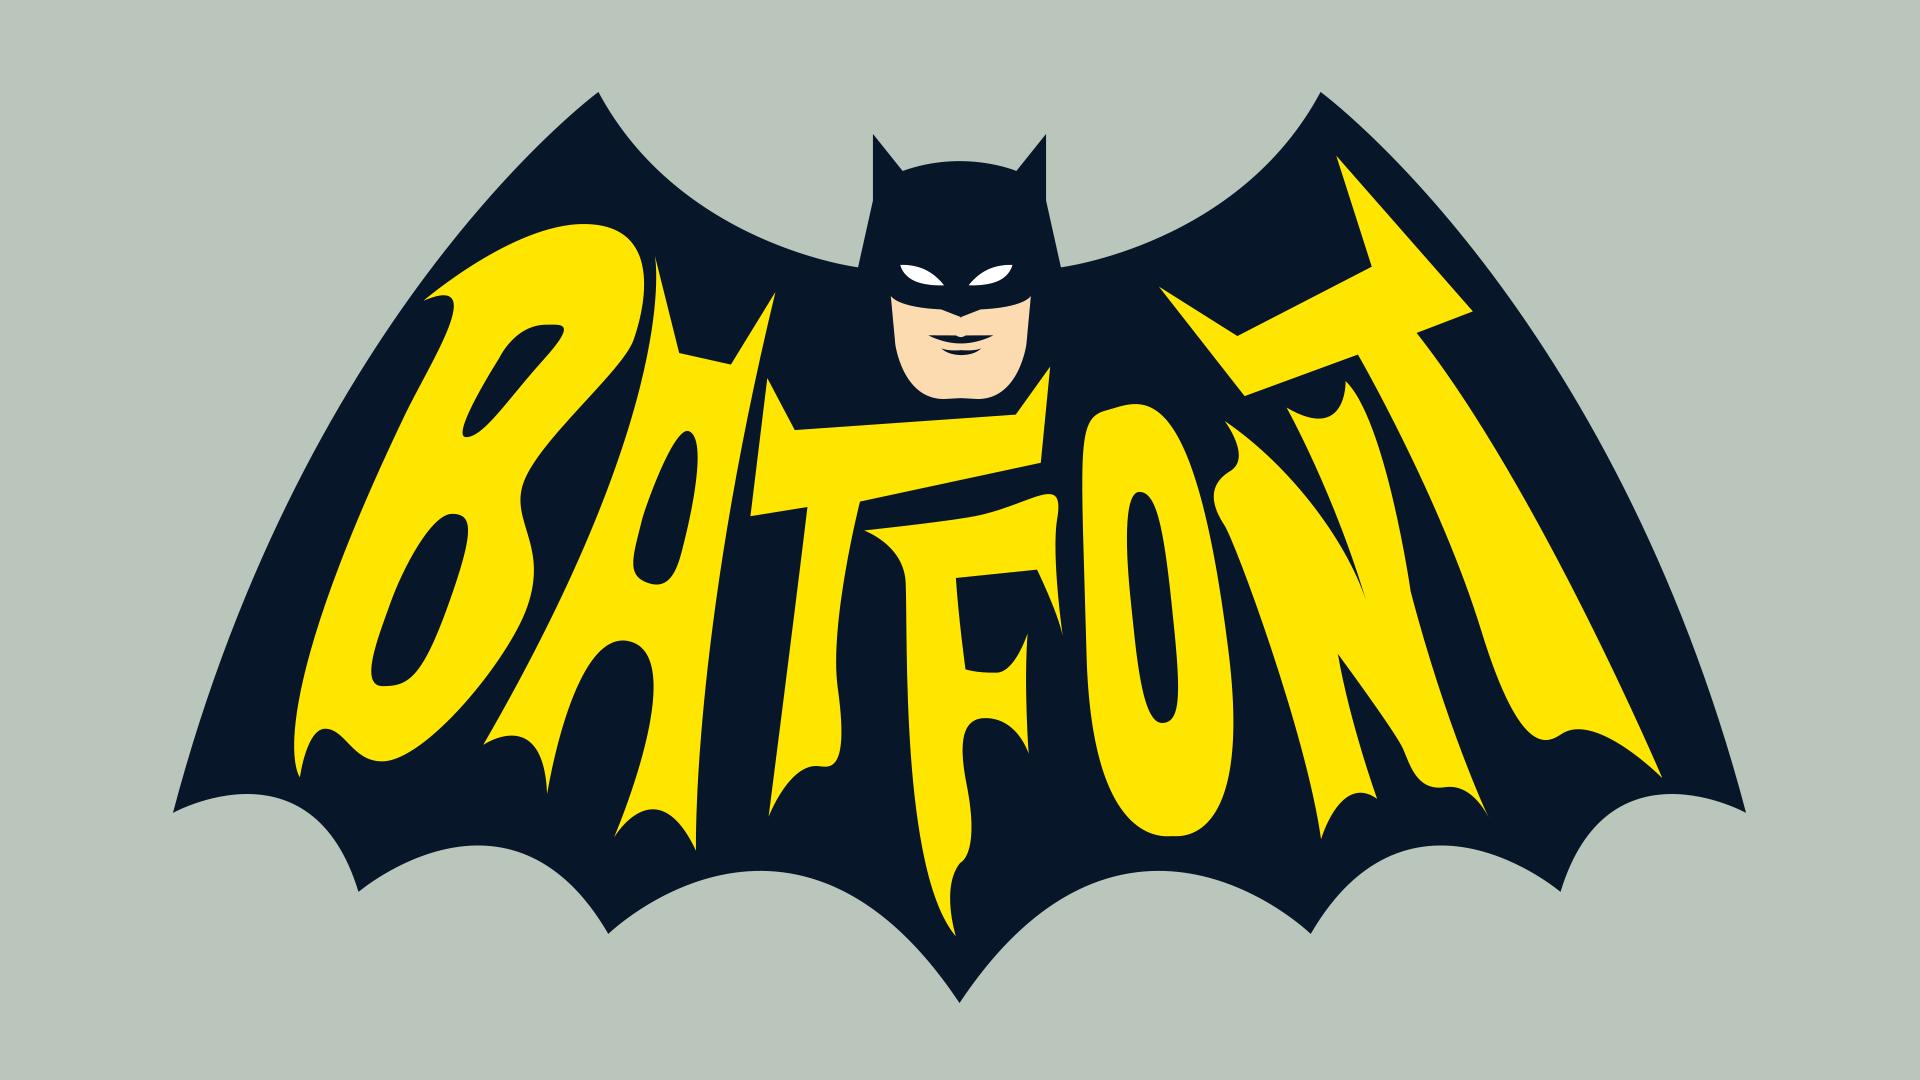 Download Batfont cool free fonts